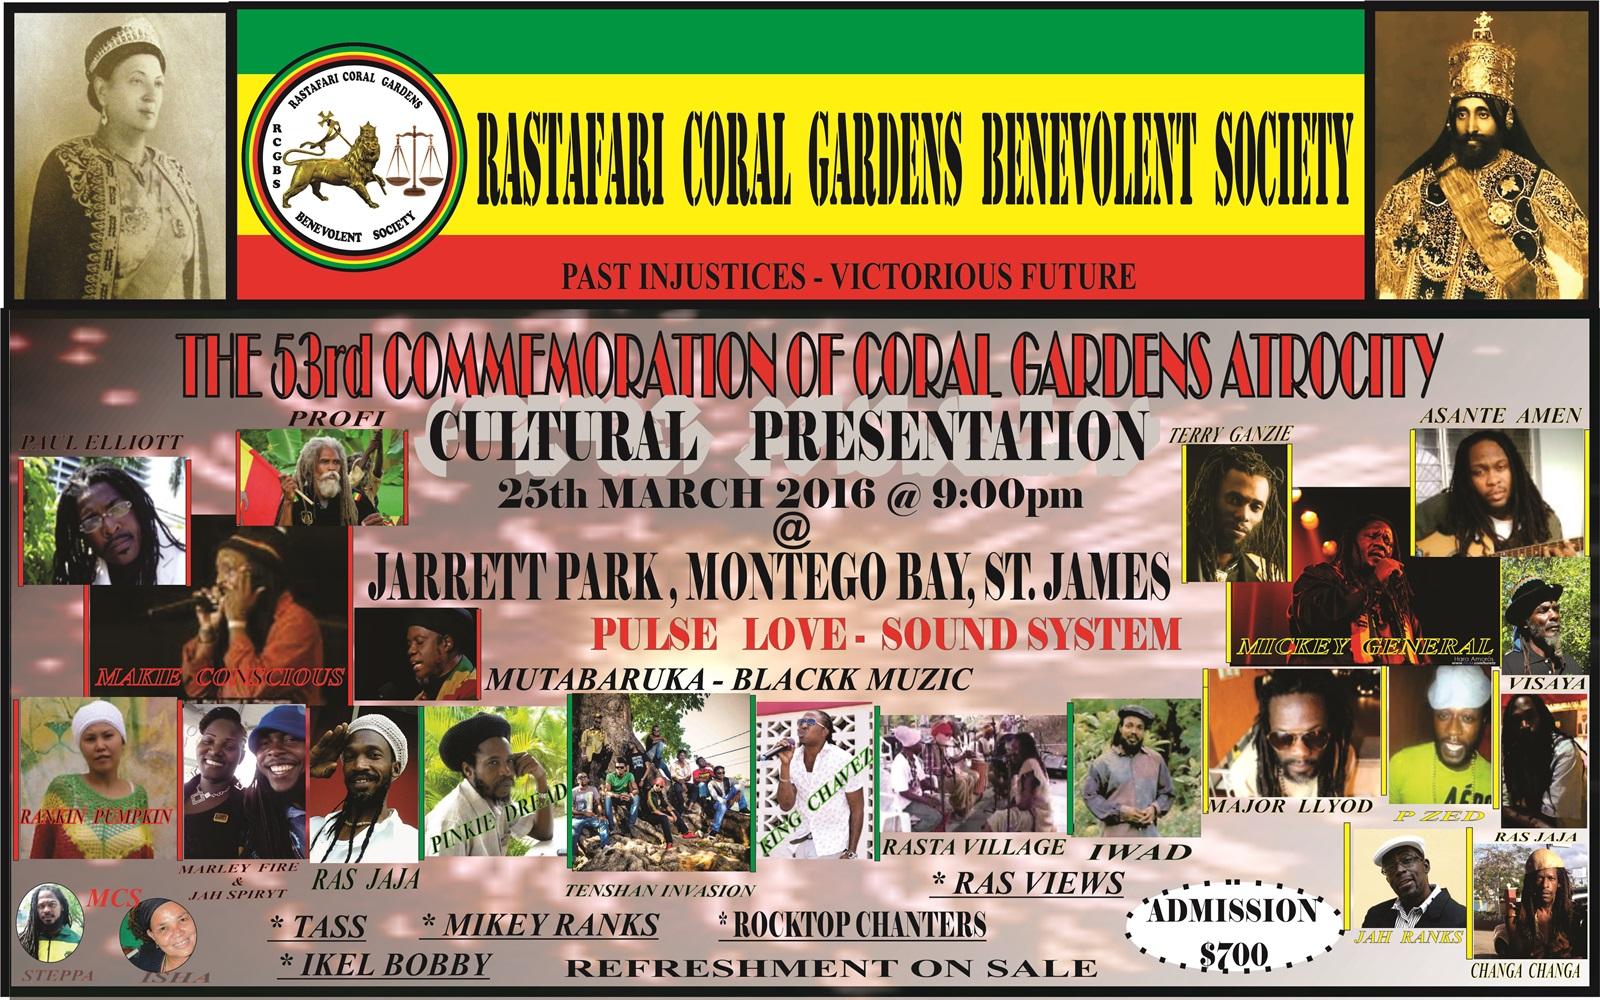 Coral Garden Rastafari Elders momorial